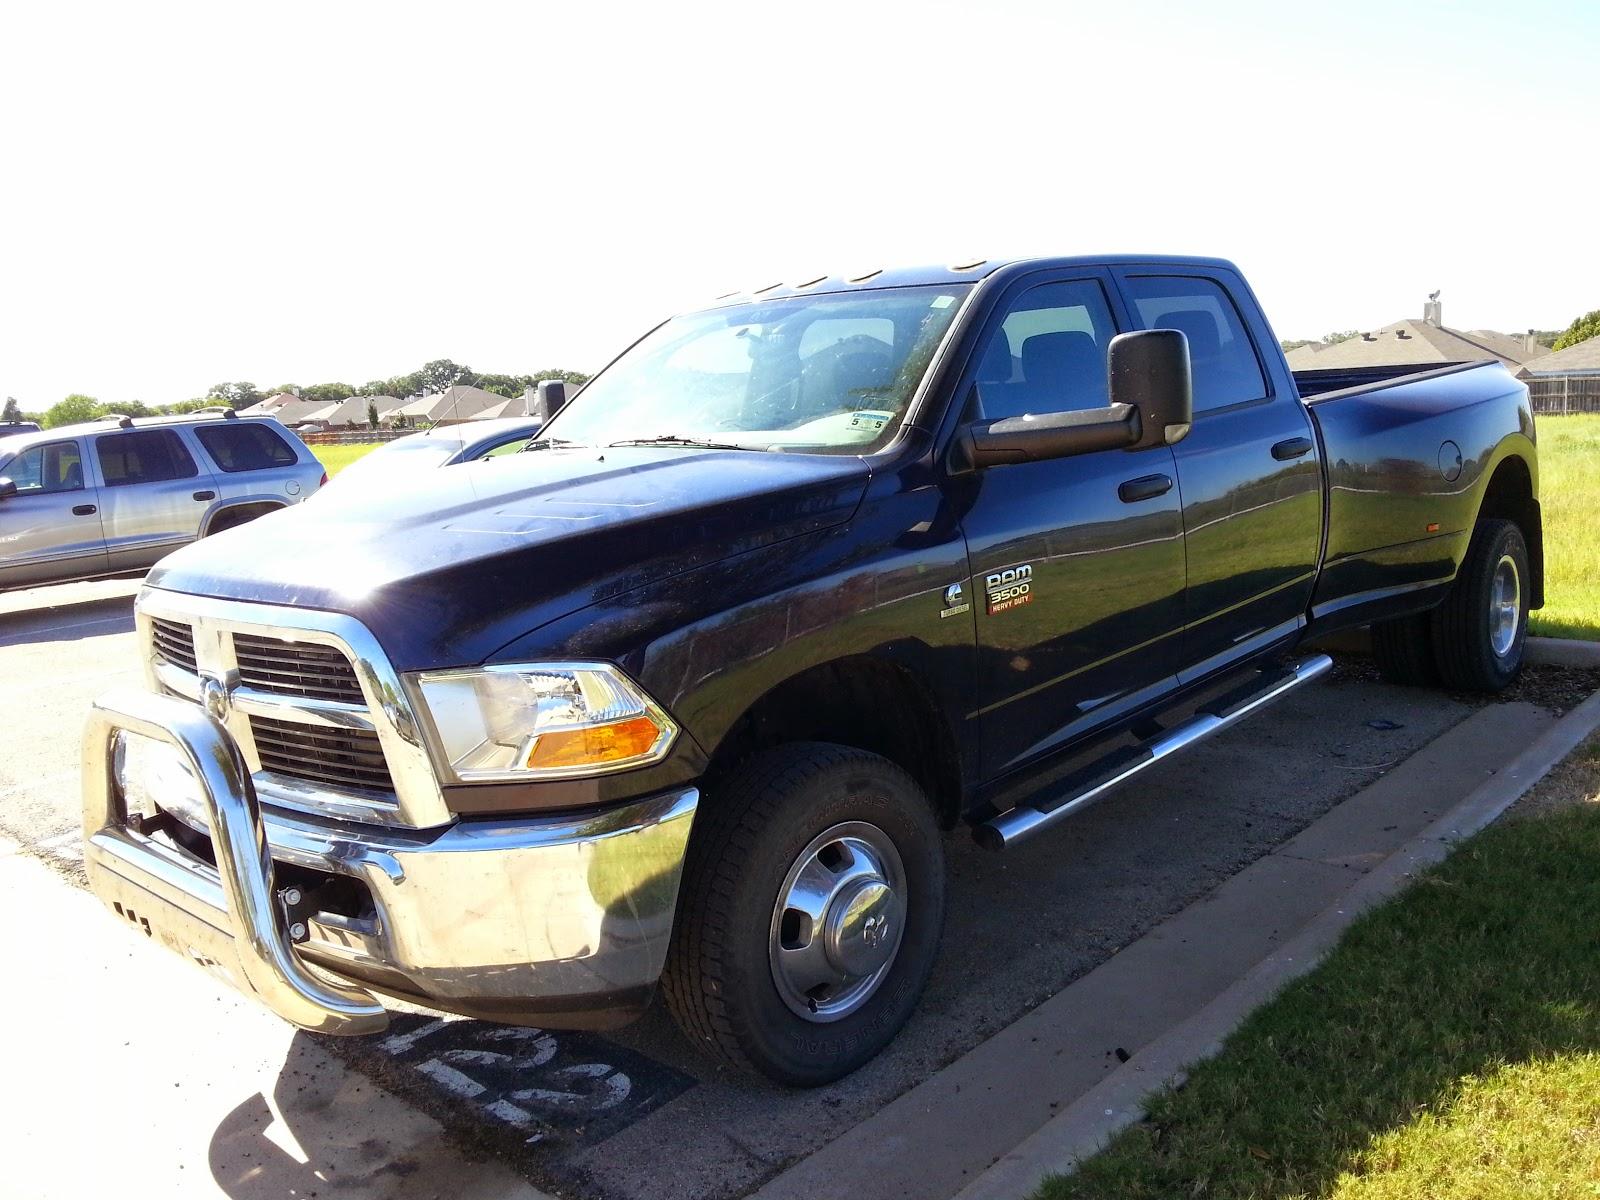 2014 Gmc 2500 Hd 6 6 Durmax Diesel For Sale Autos Post